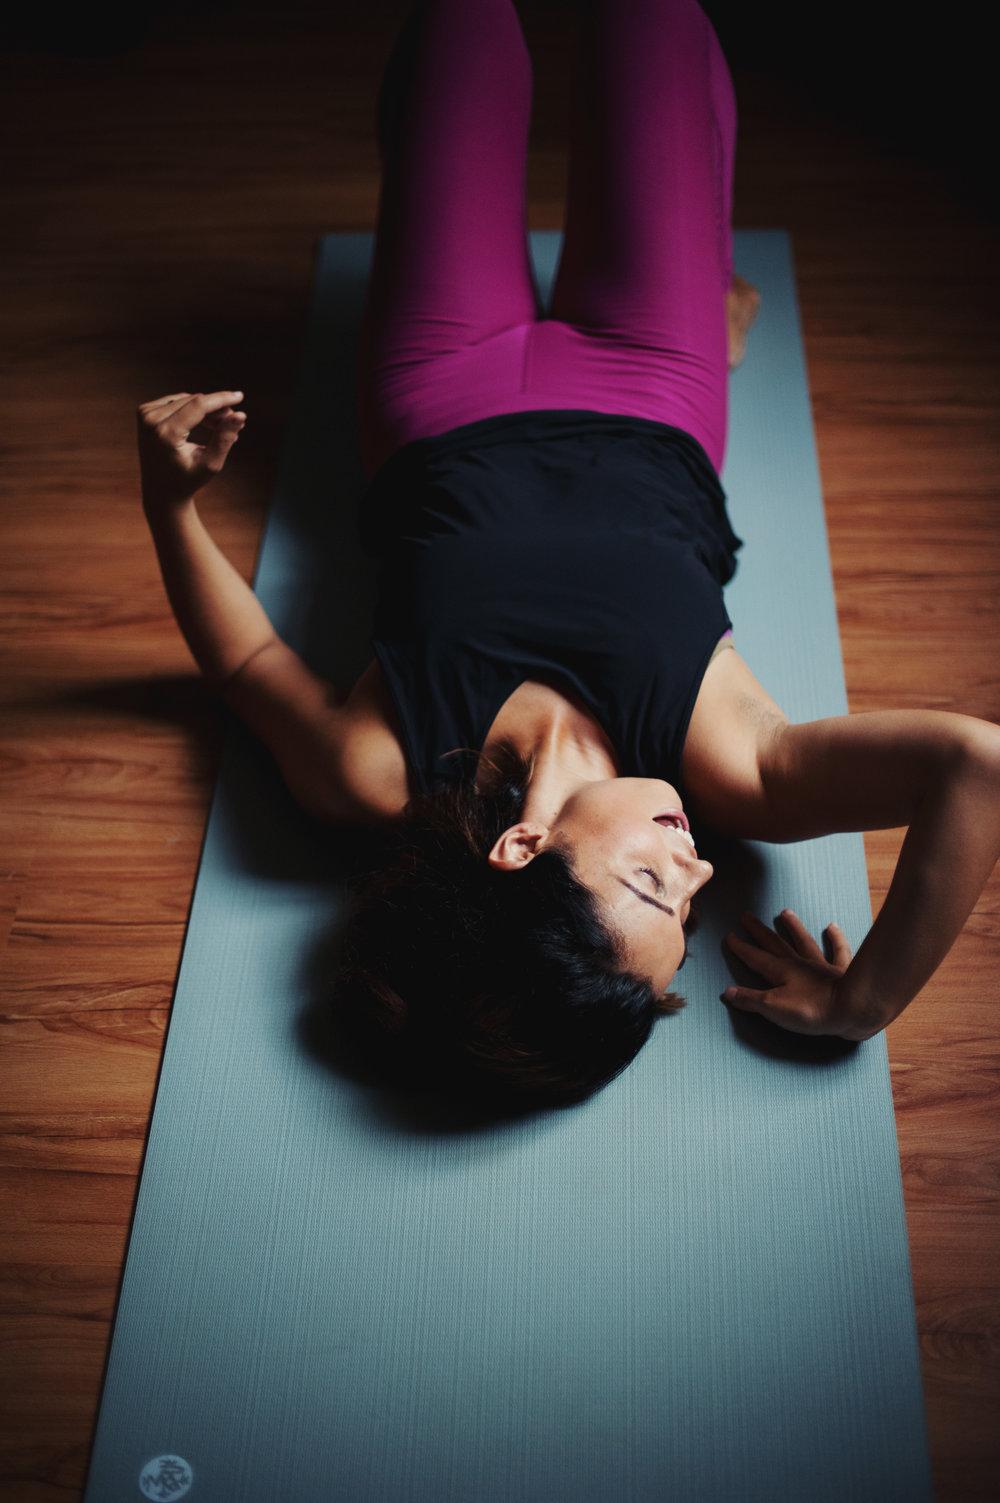 yoga-picture-the-vinyasa-people-katy-scherer-8.jpg